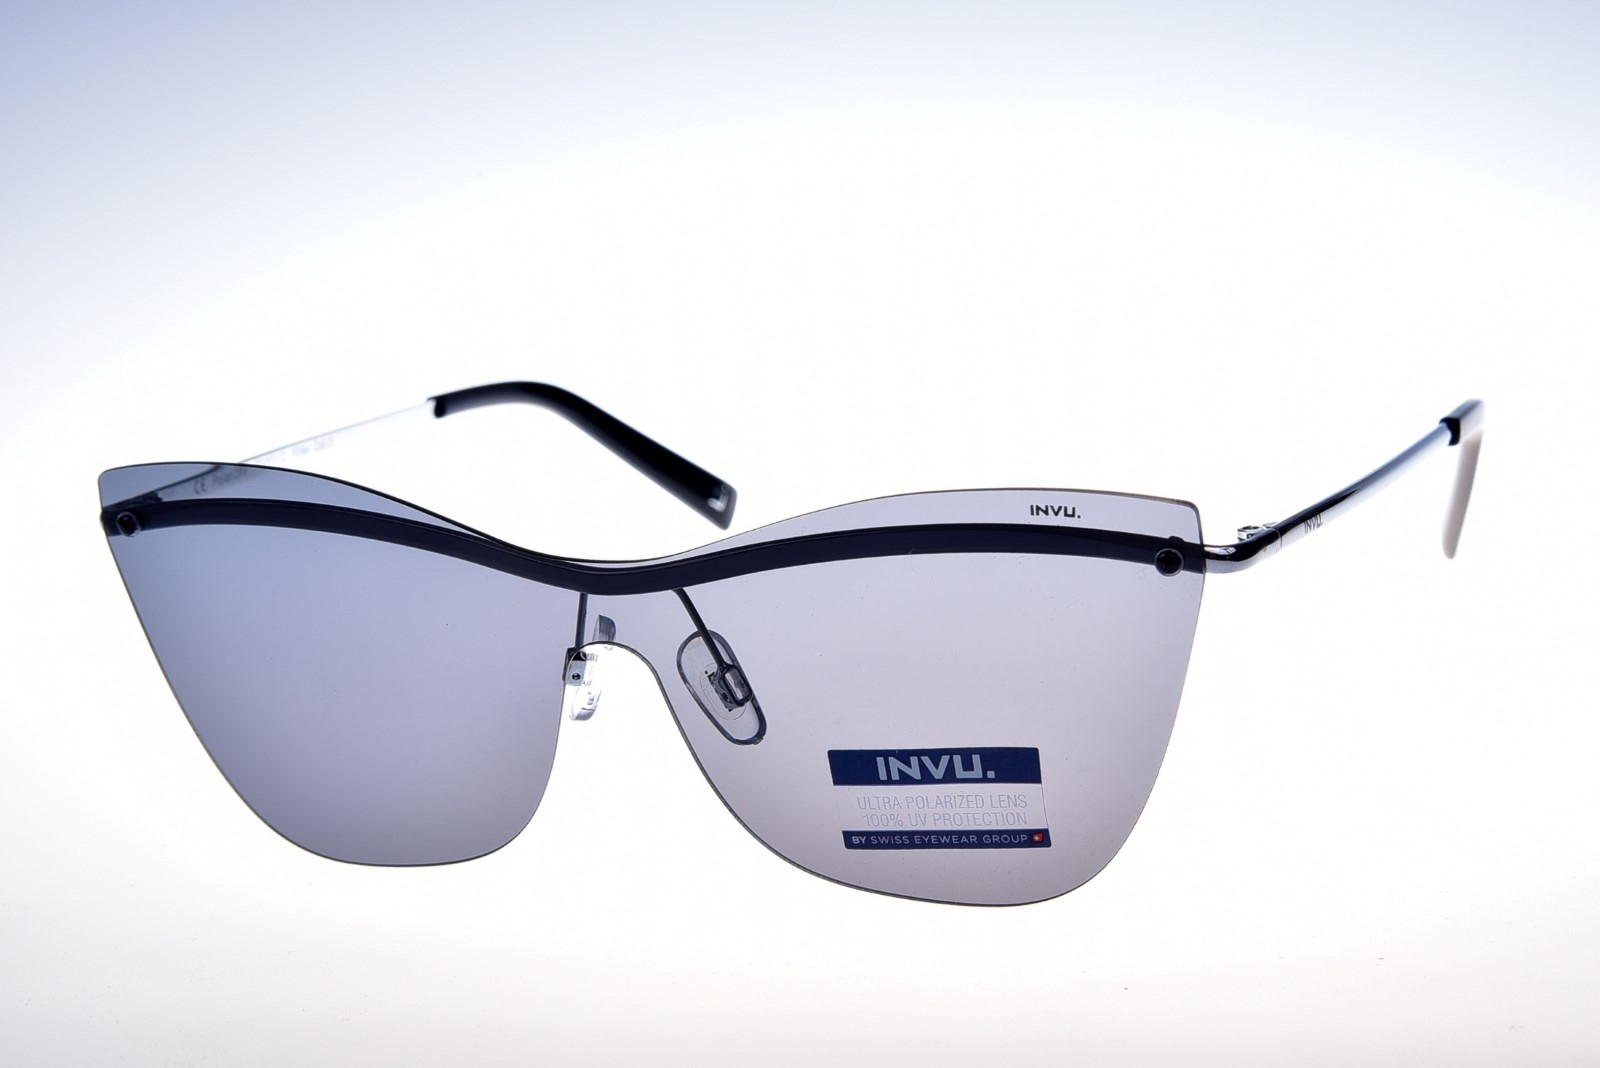 INVU. Trend T1011C - Dámske slnečné okuliare